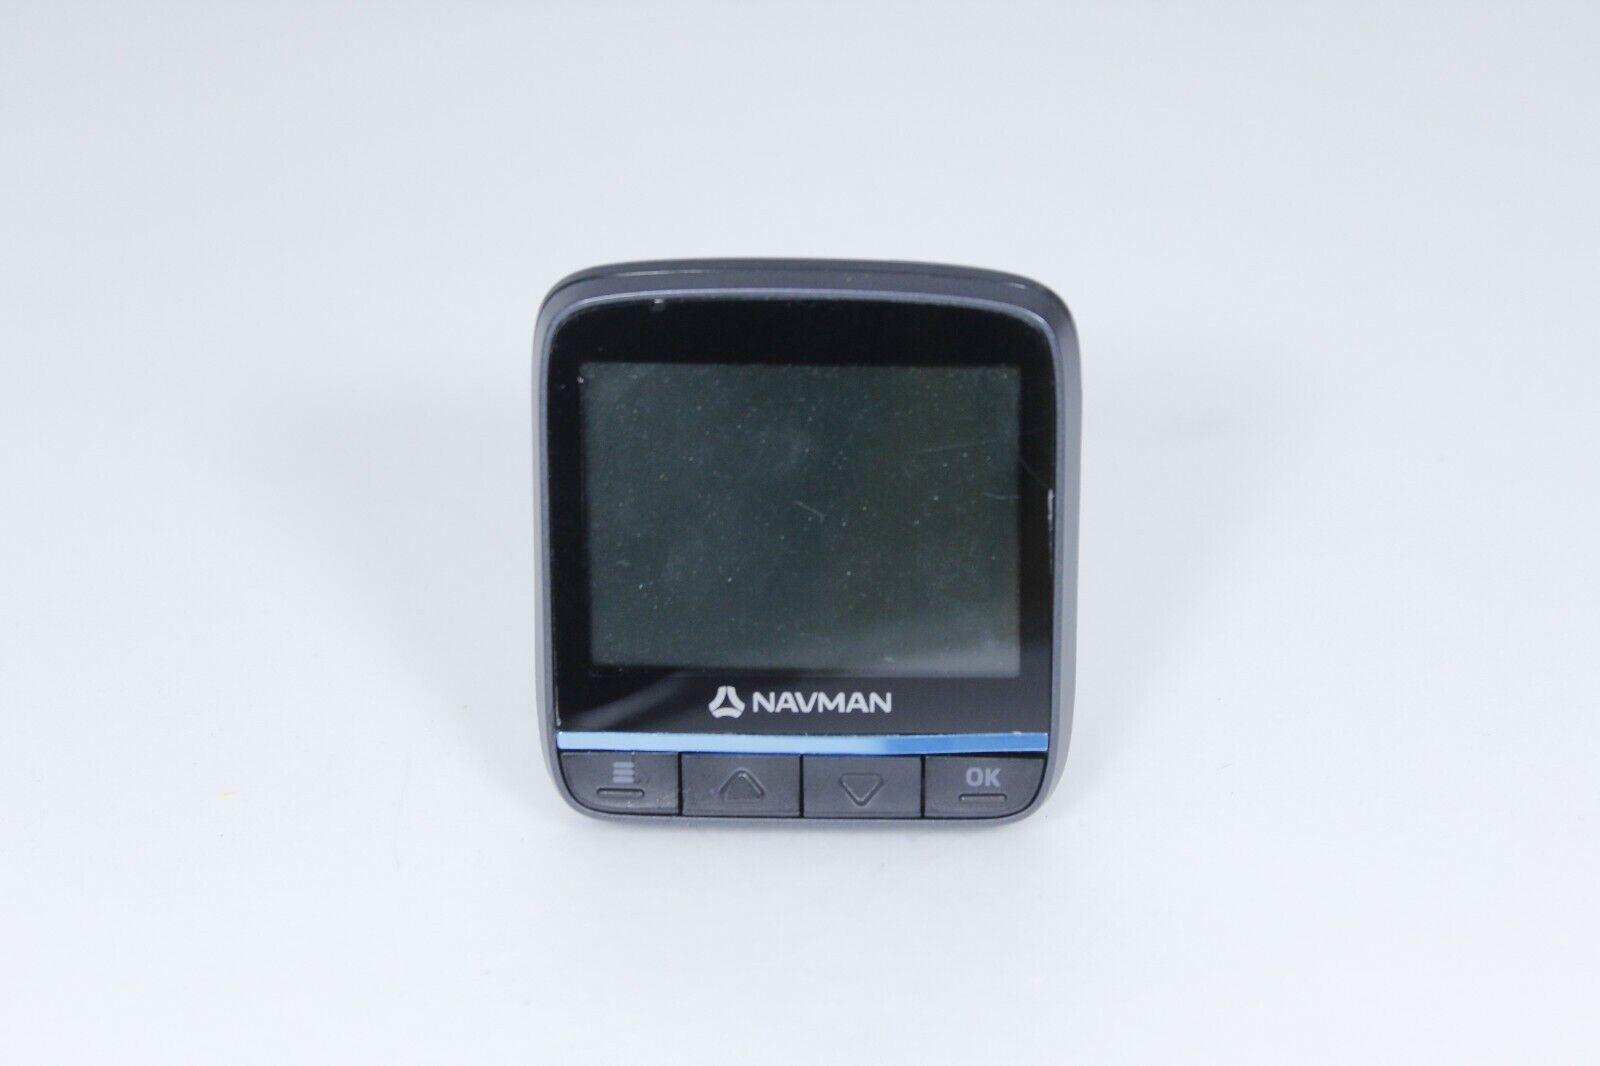 GENUINE NAVMAN MIVUE 358 DIGITAL DRIVE RECORDER 1080P DASH CAM   Faulty